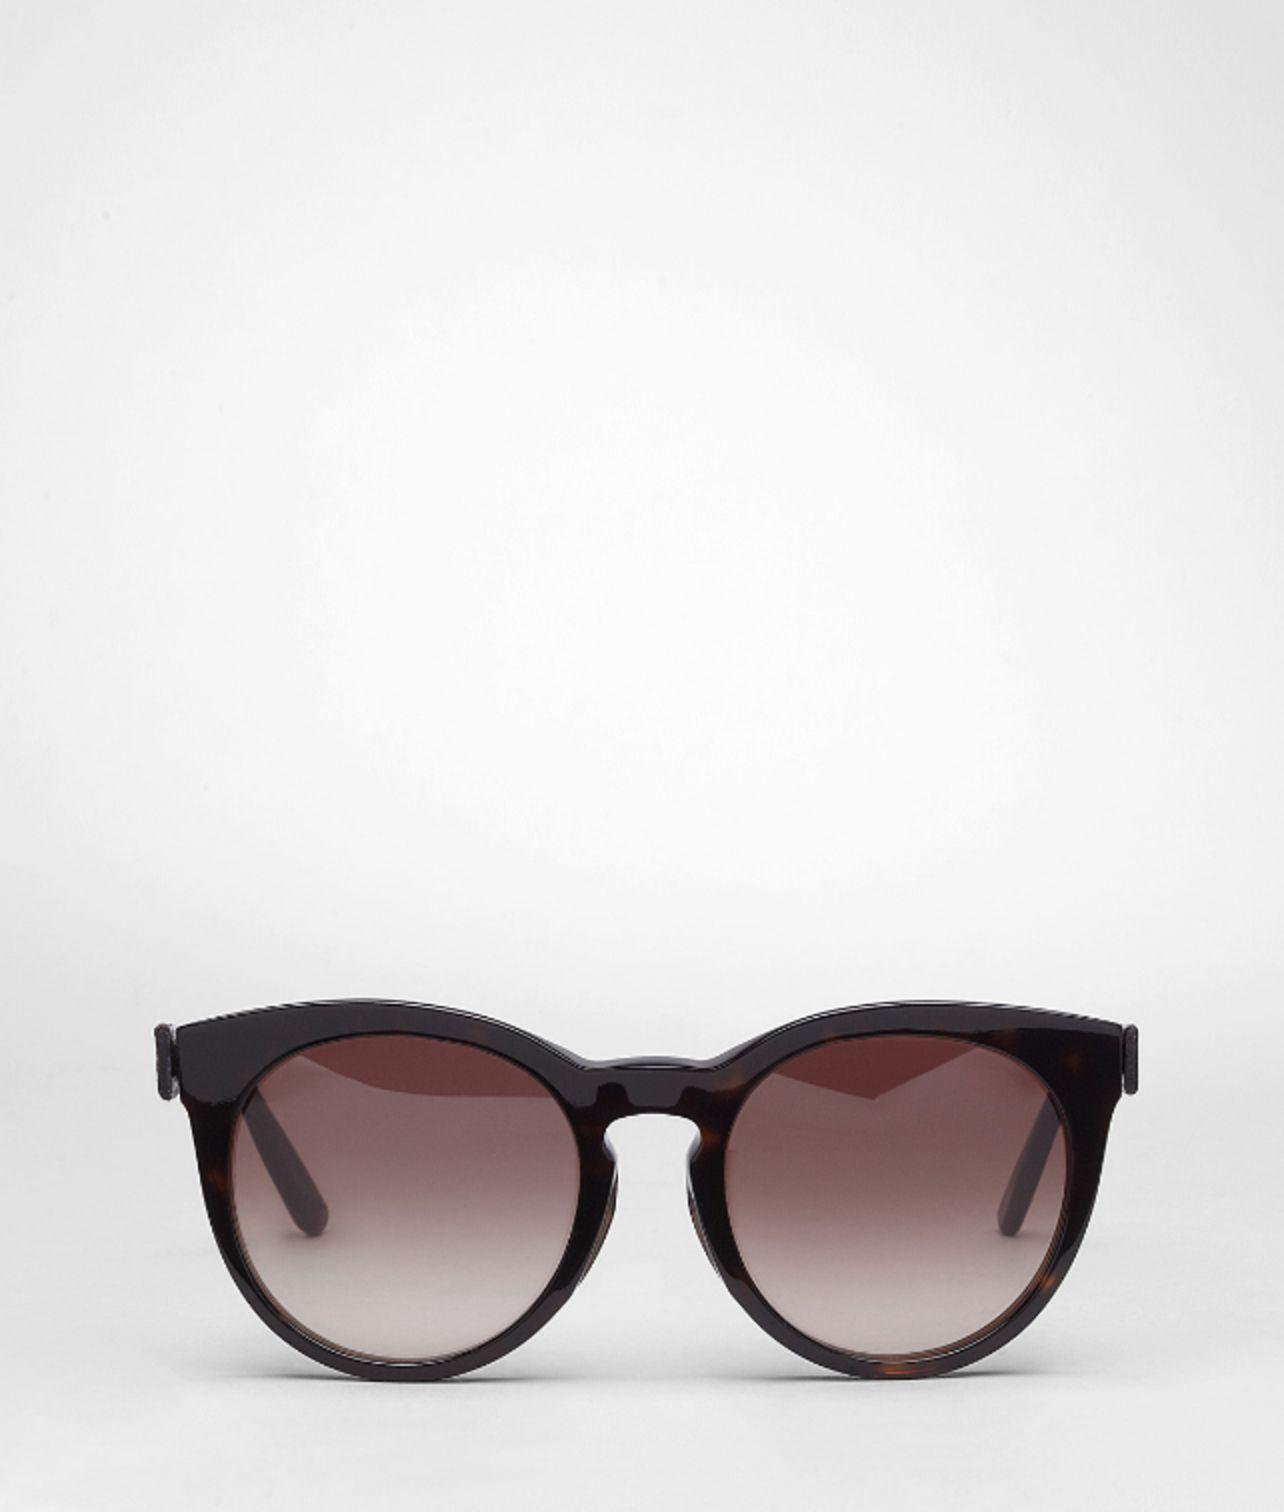 68dd883d94 Lyst - Bottega Veneta Havana Brown Shaded Acetate Eyewear Bv 253 Fs ...